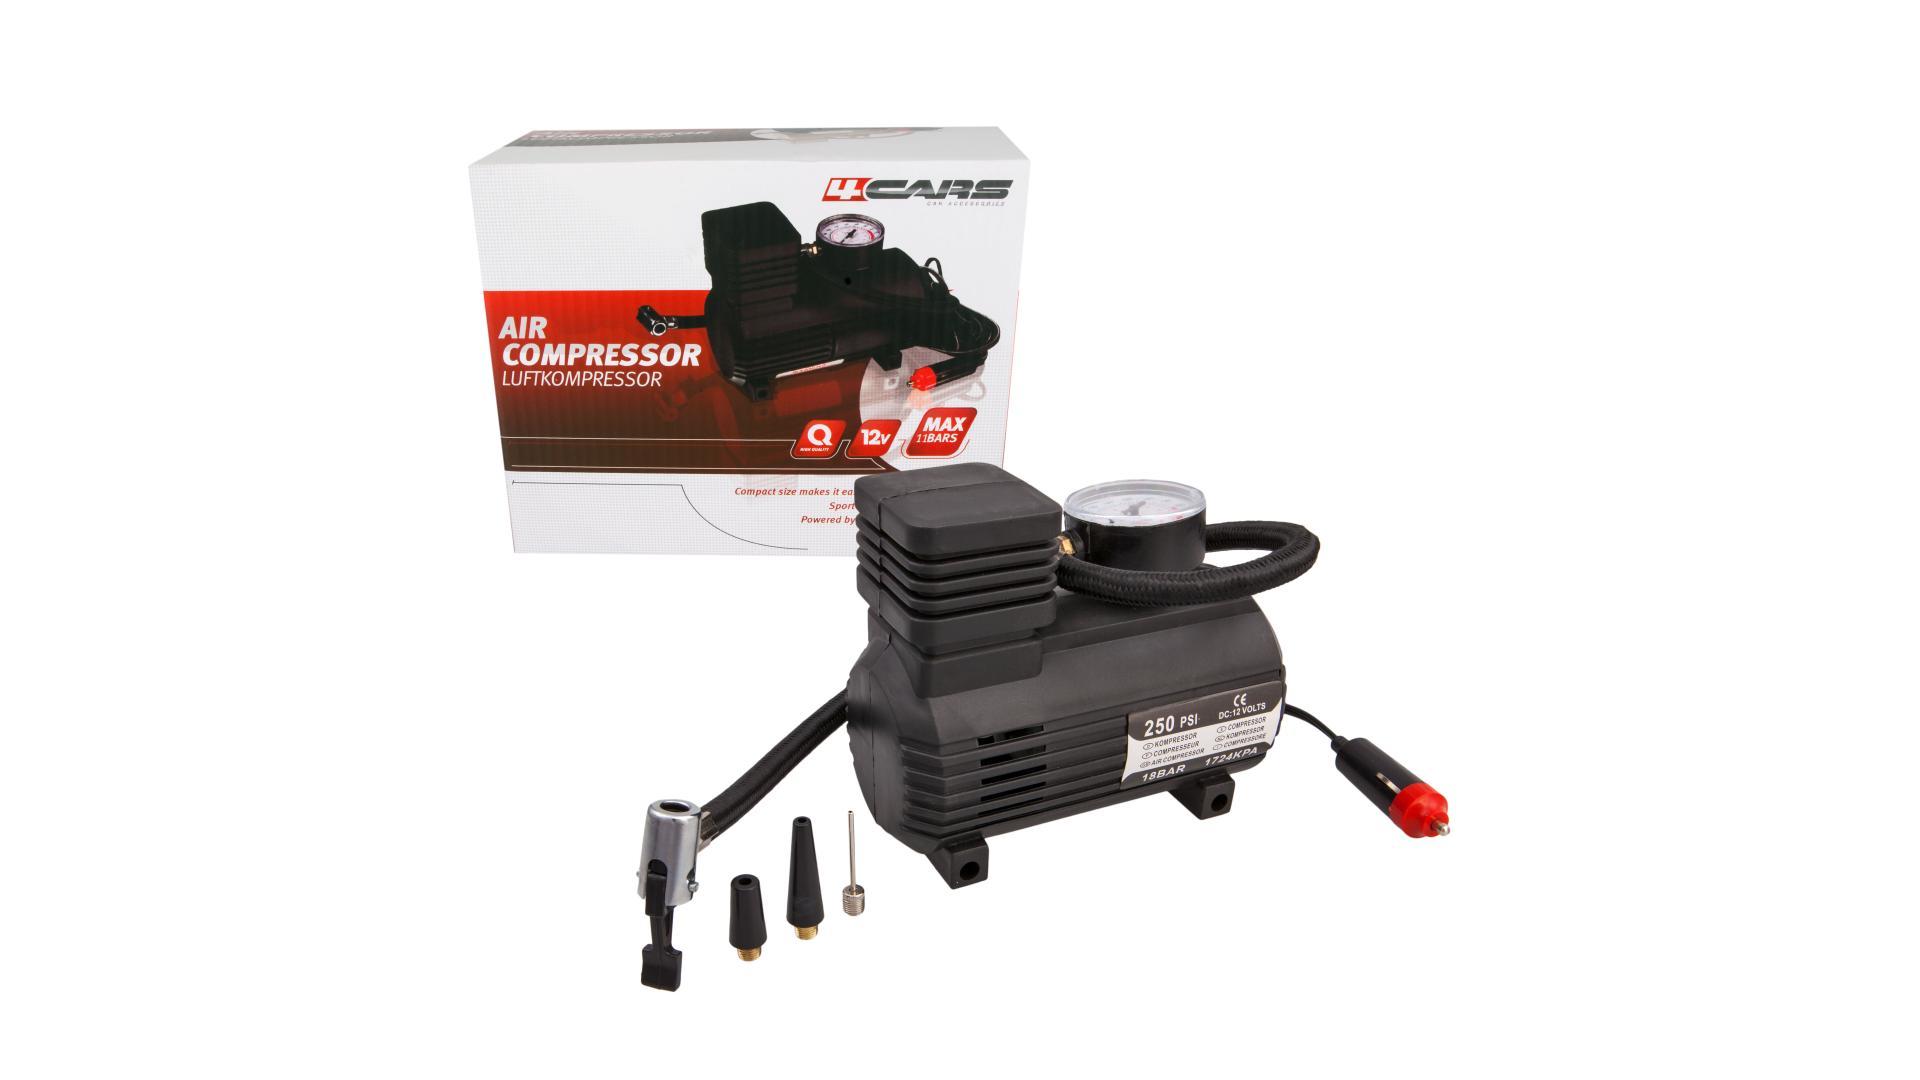 4CARS Kompresor 250 PSI, 18 BAR, 12V